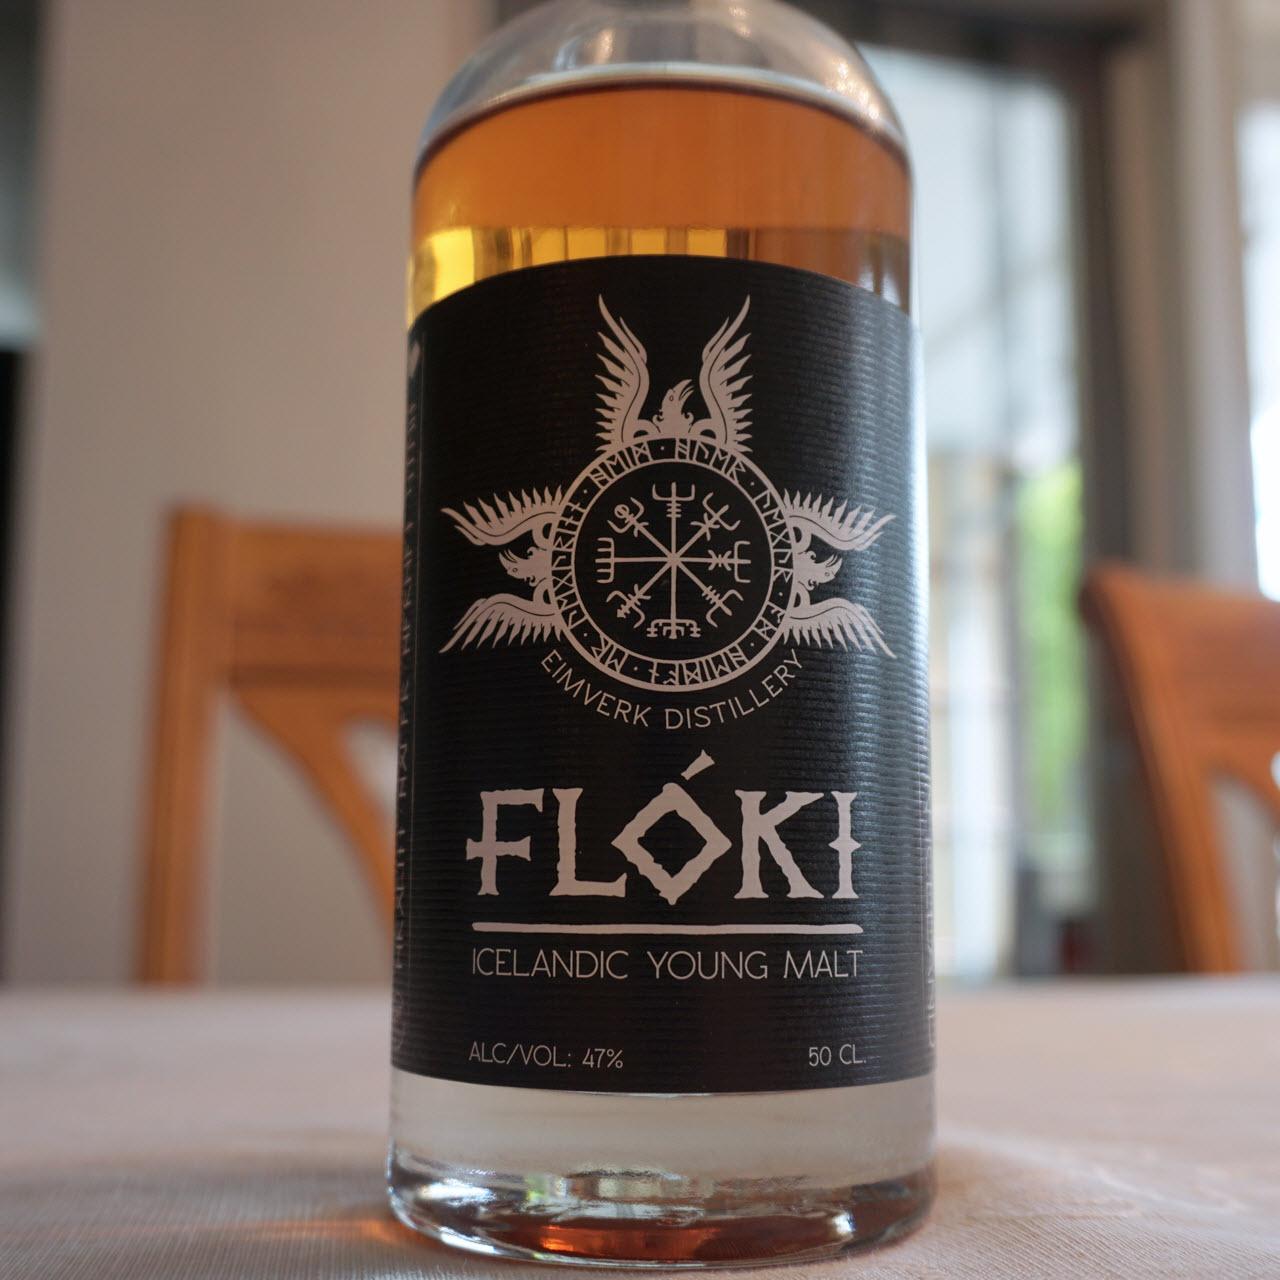 Flóki - Icelandic Young Malt 1st Edition